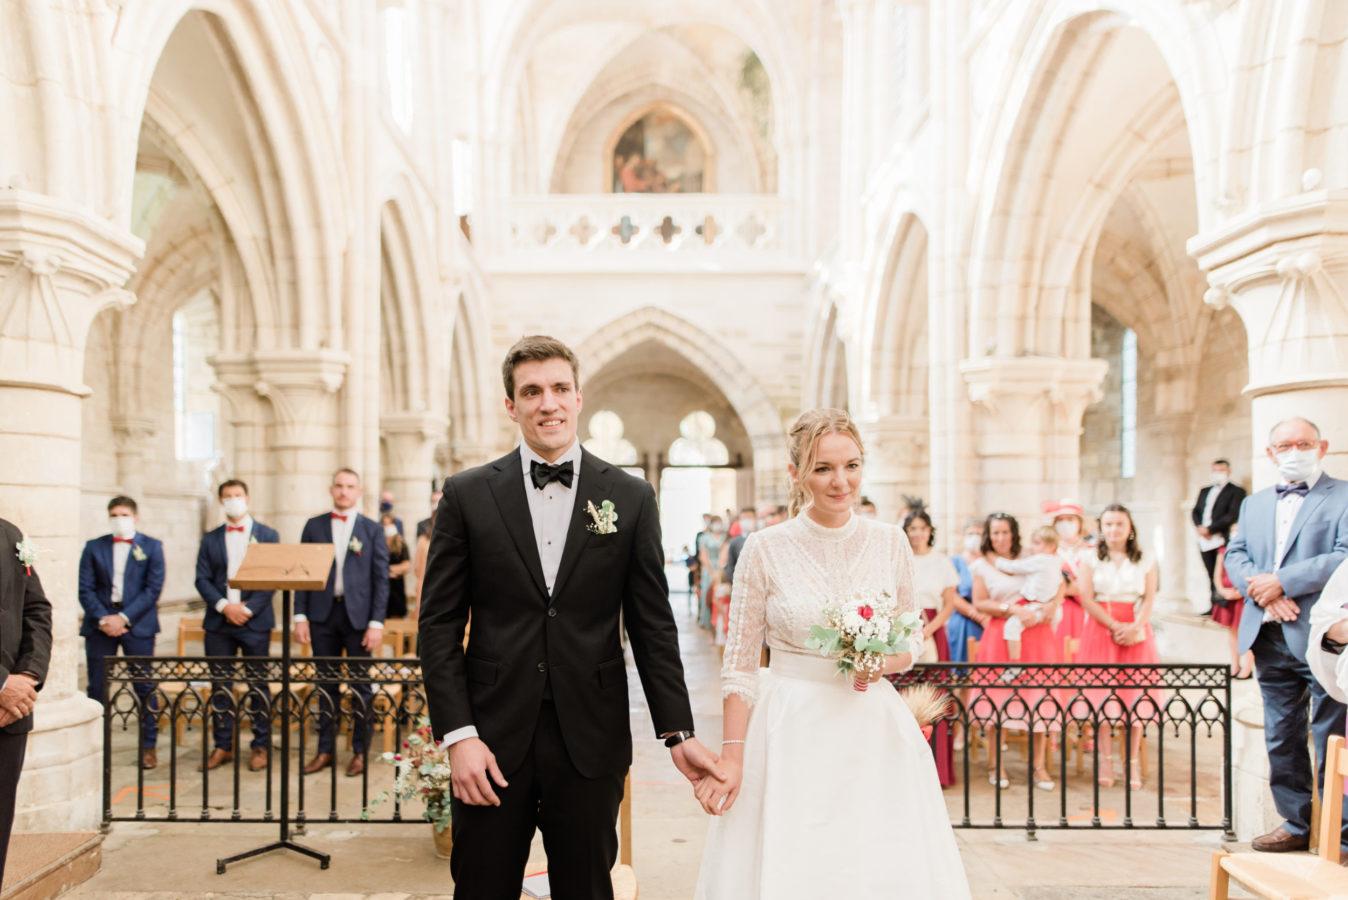 priscillapuzenat-photographe-mariage-abbaye-reigny-vermenton-yonne-bourgogne-france